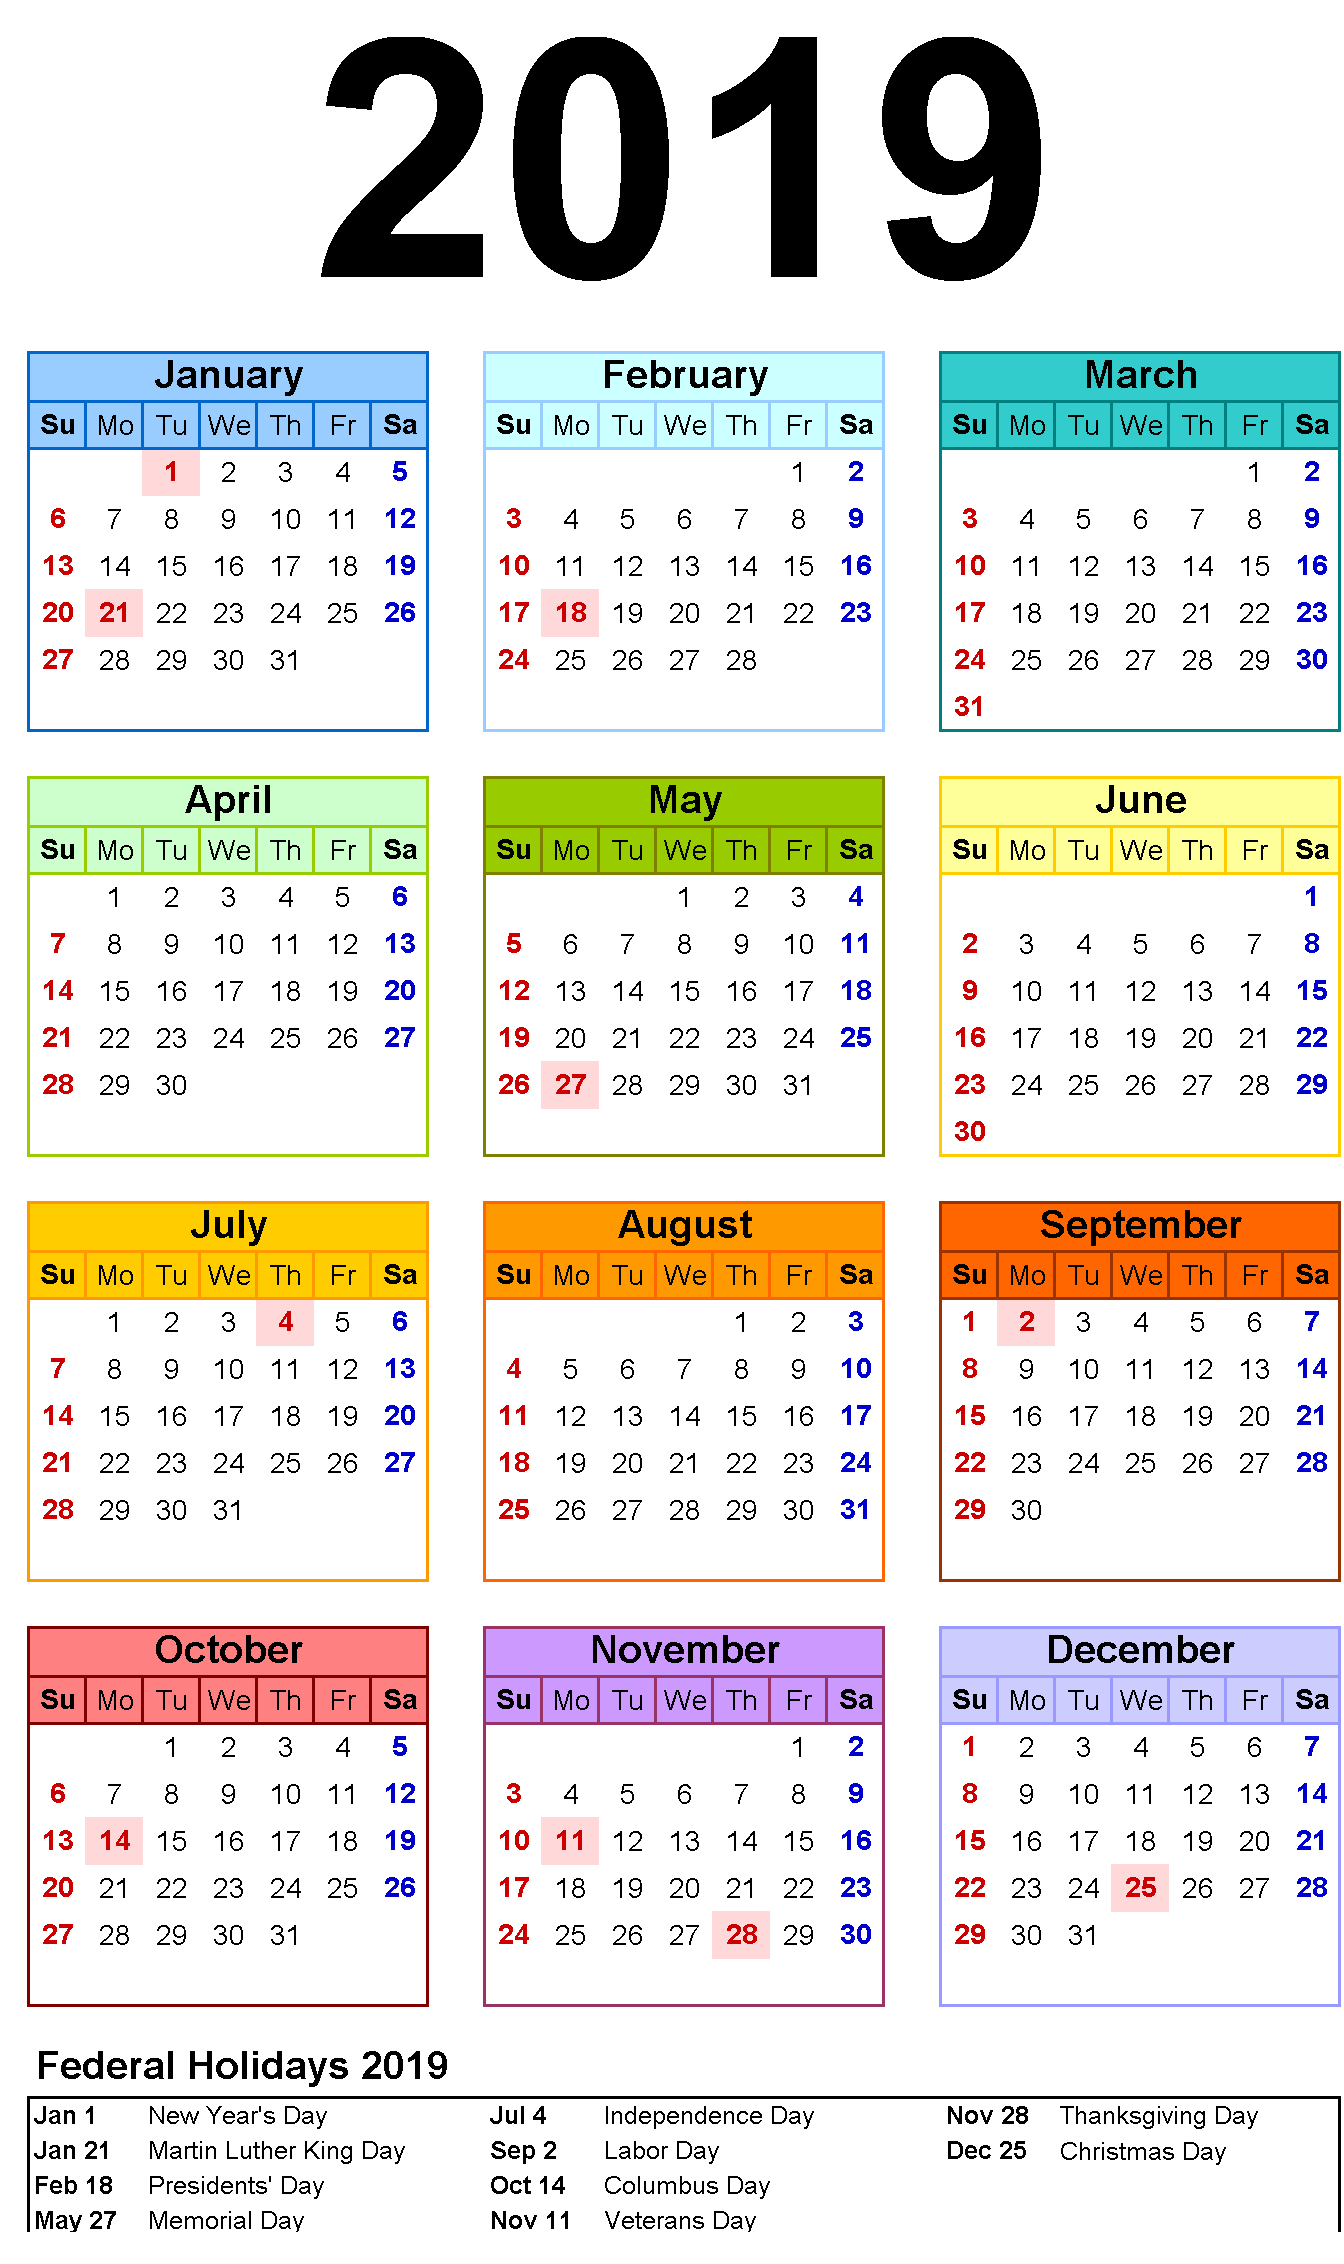 12 Month Calendar In One Page #2019Calendar #holidayscalendar